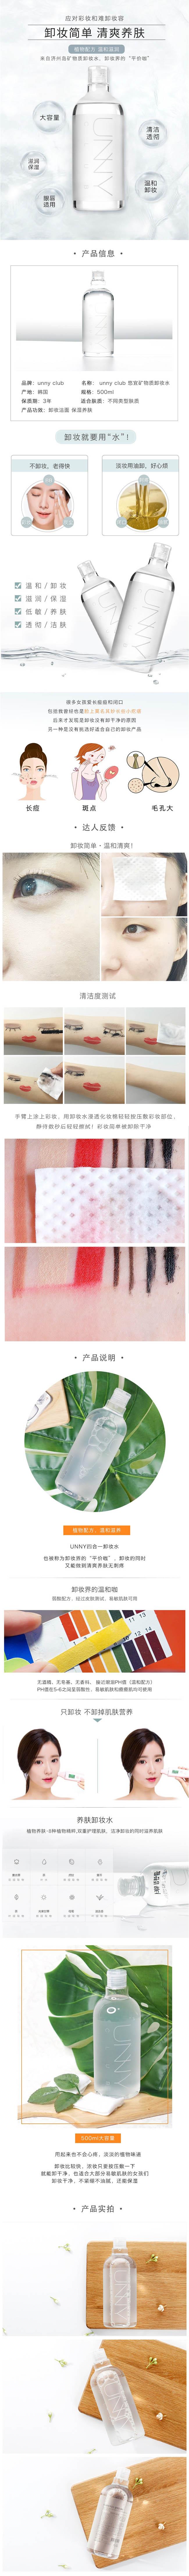 images/1/2018/06/DMKOPMTO82tmnmOd28PoE0EMoTw00q.jpg